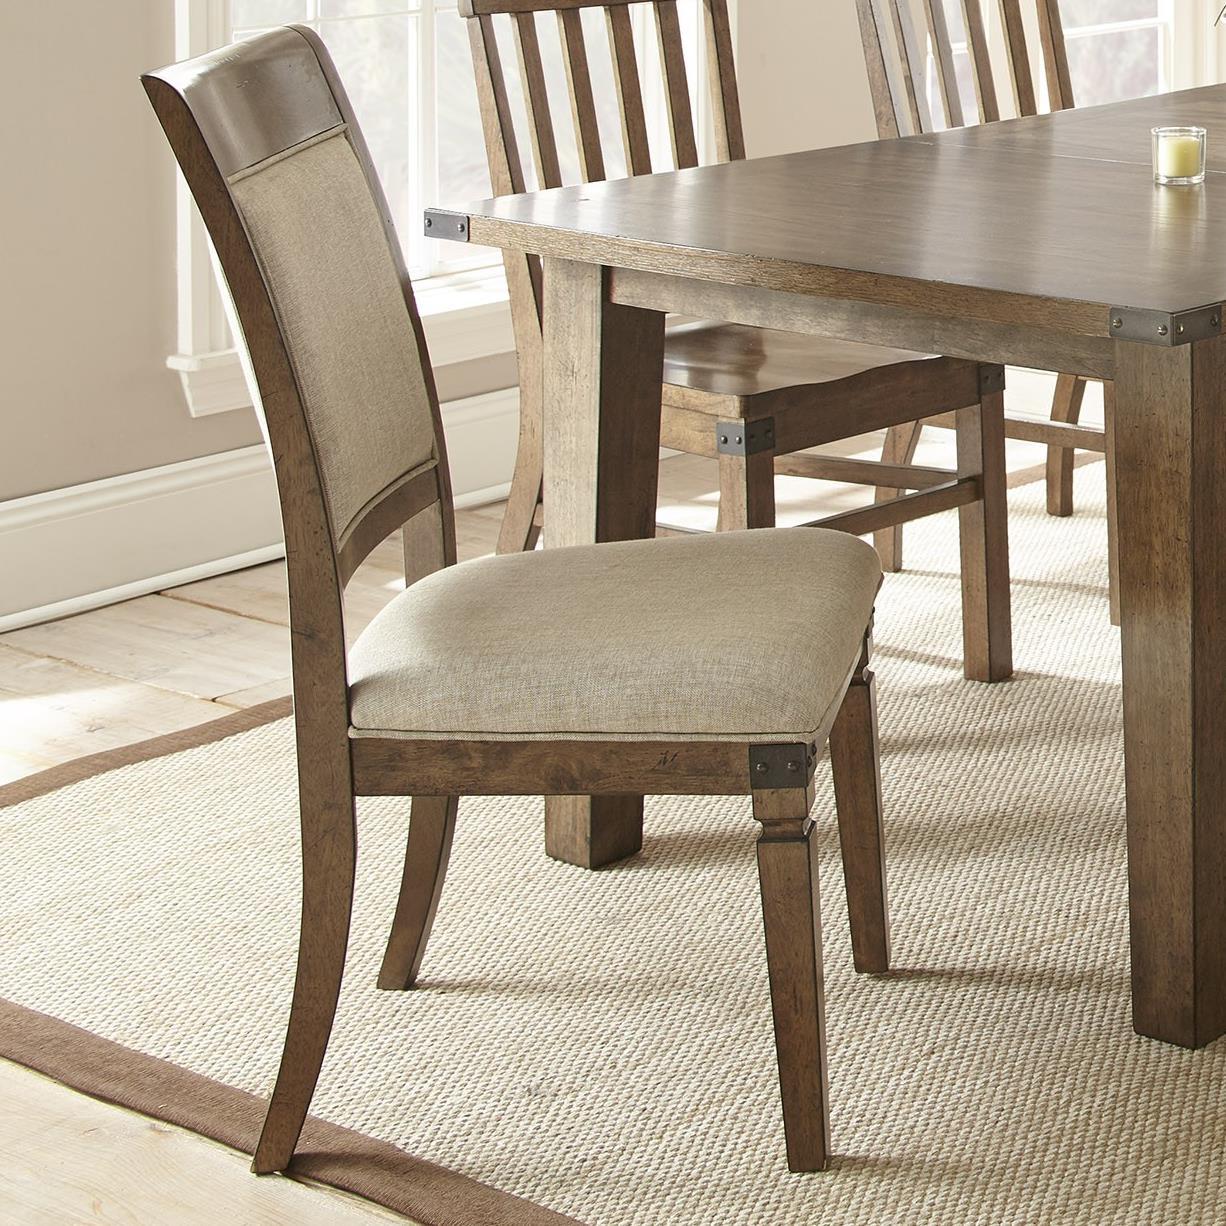 Steve Silver Hailee Dining Side Chair - Item Number: HA500SV